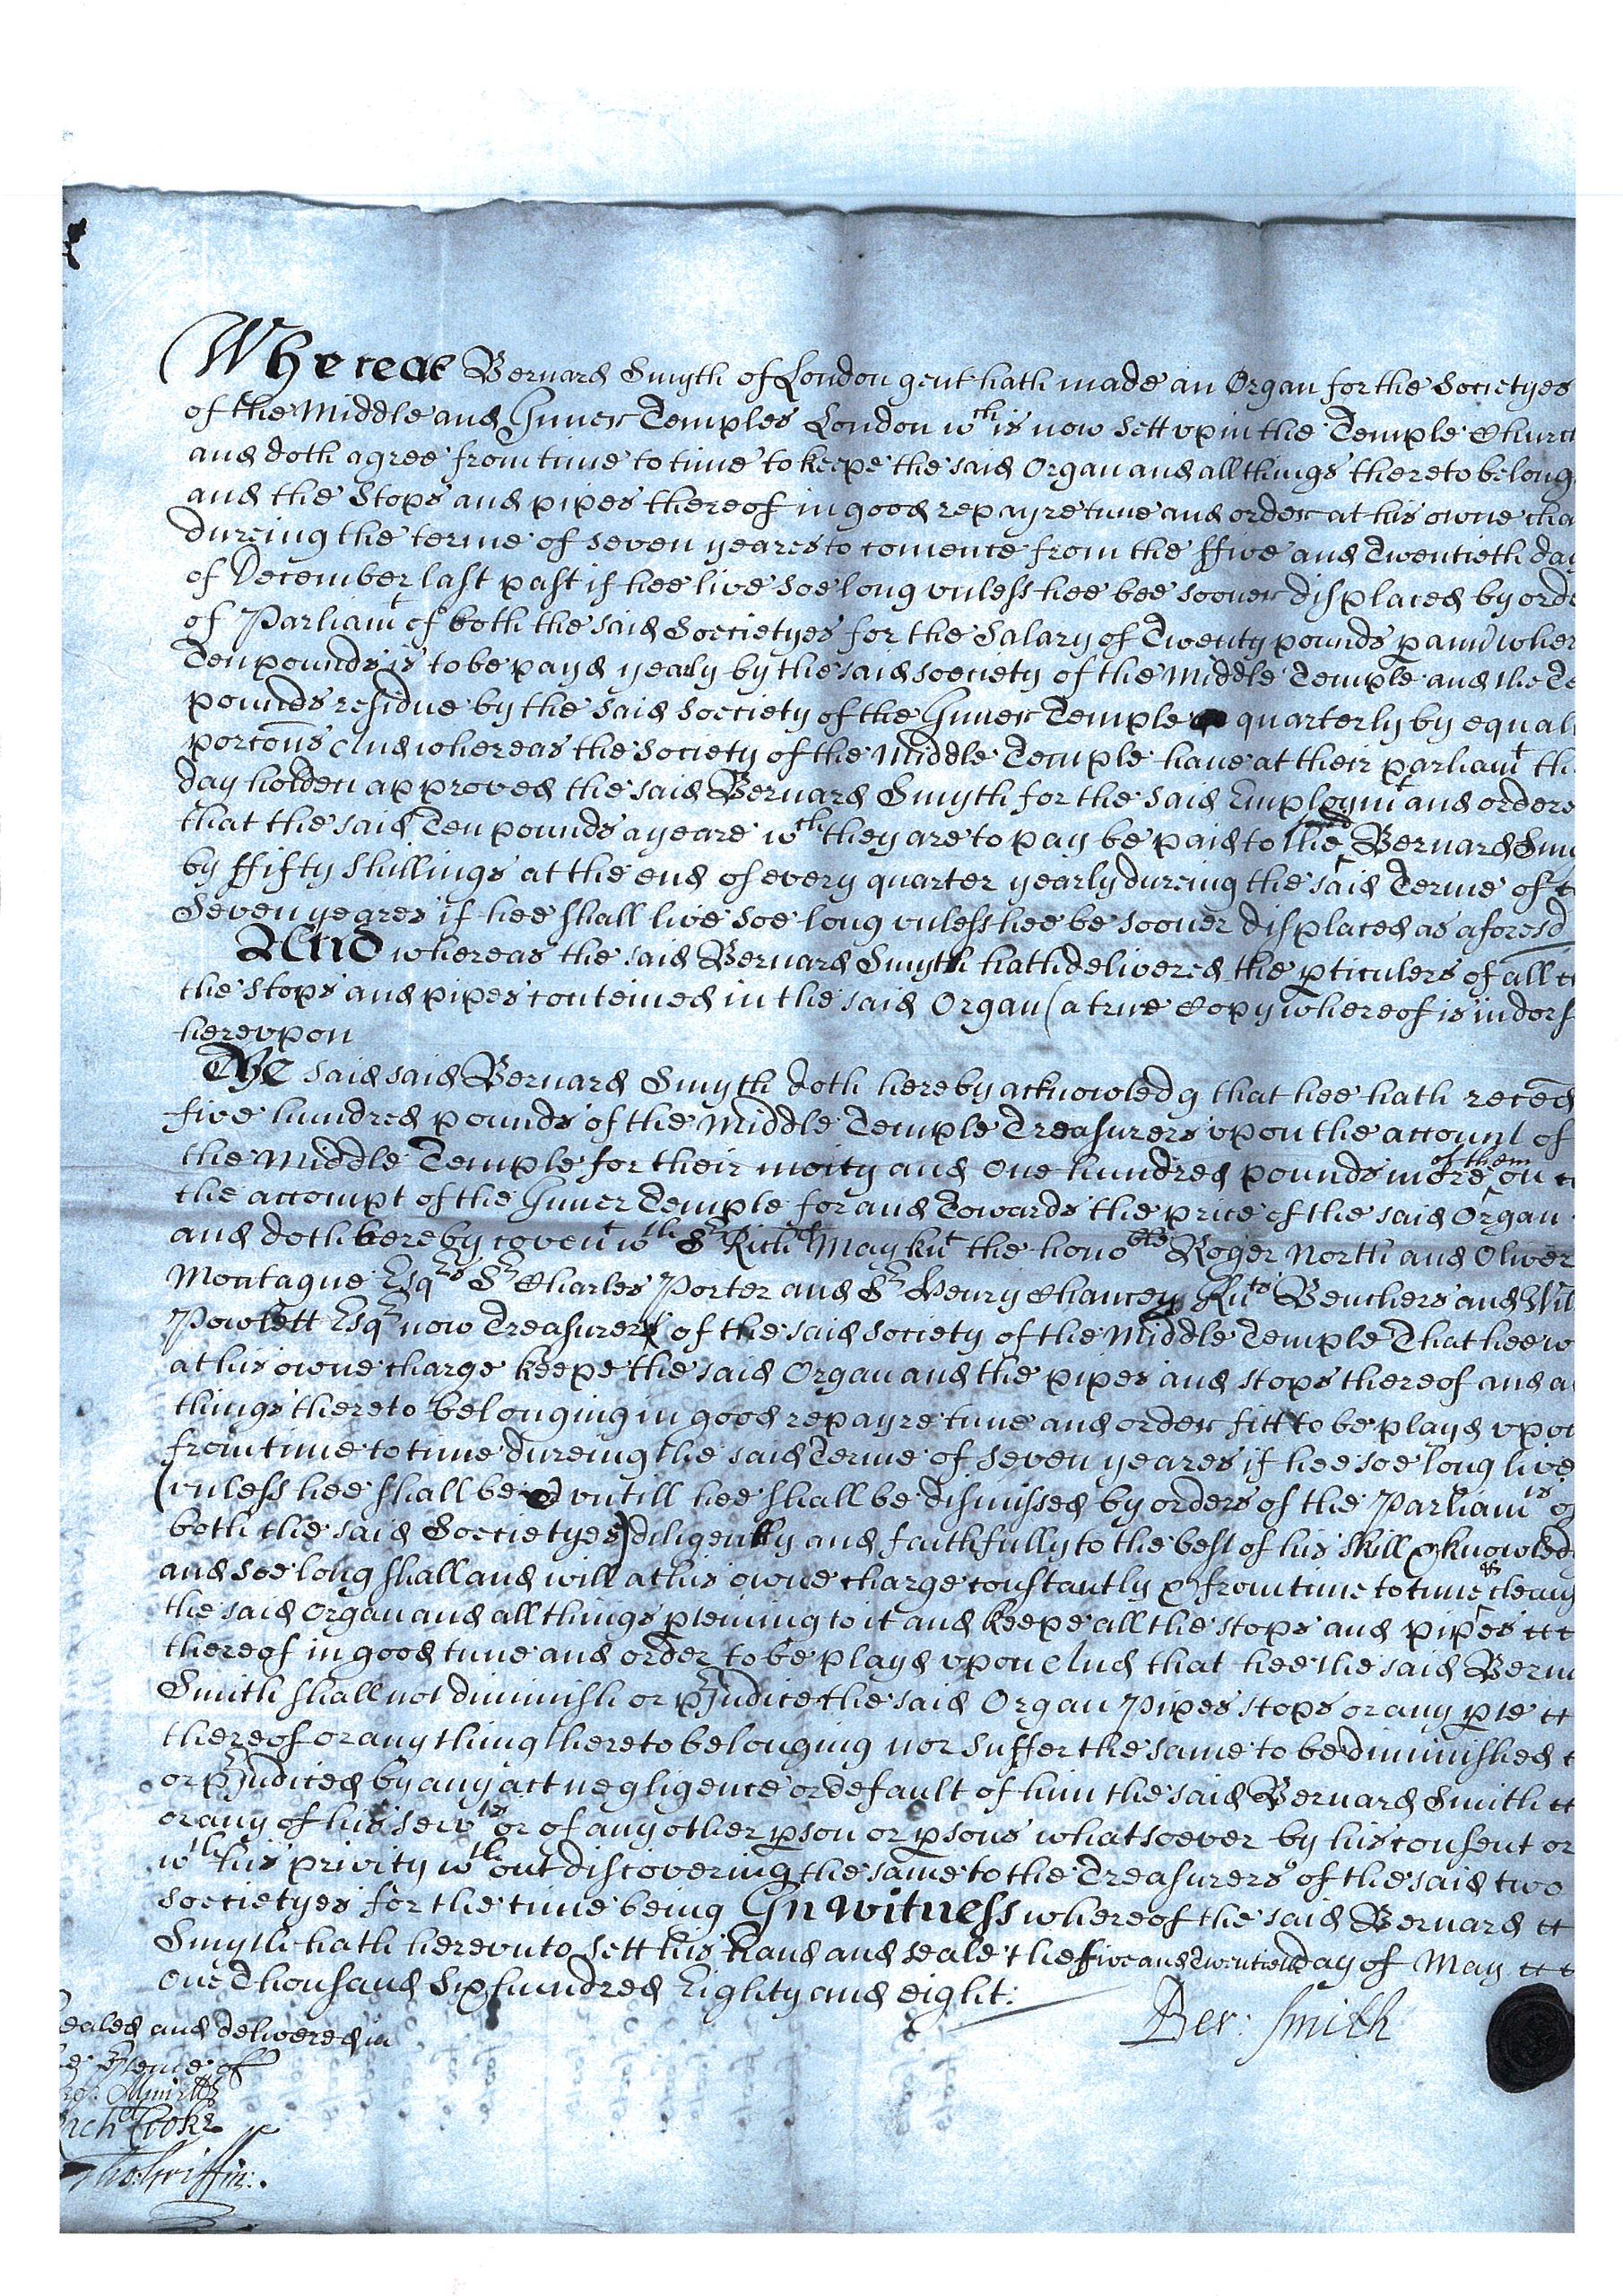 21. Smith contract.jpg